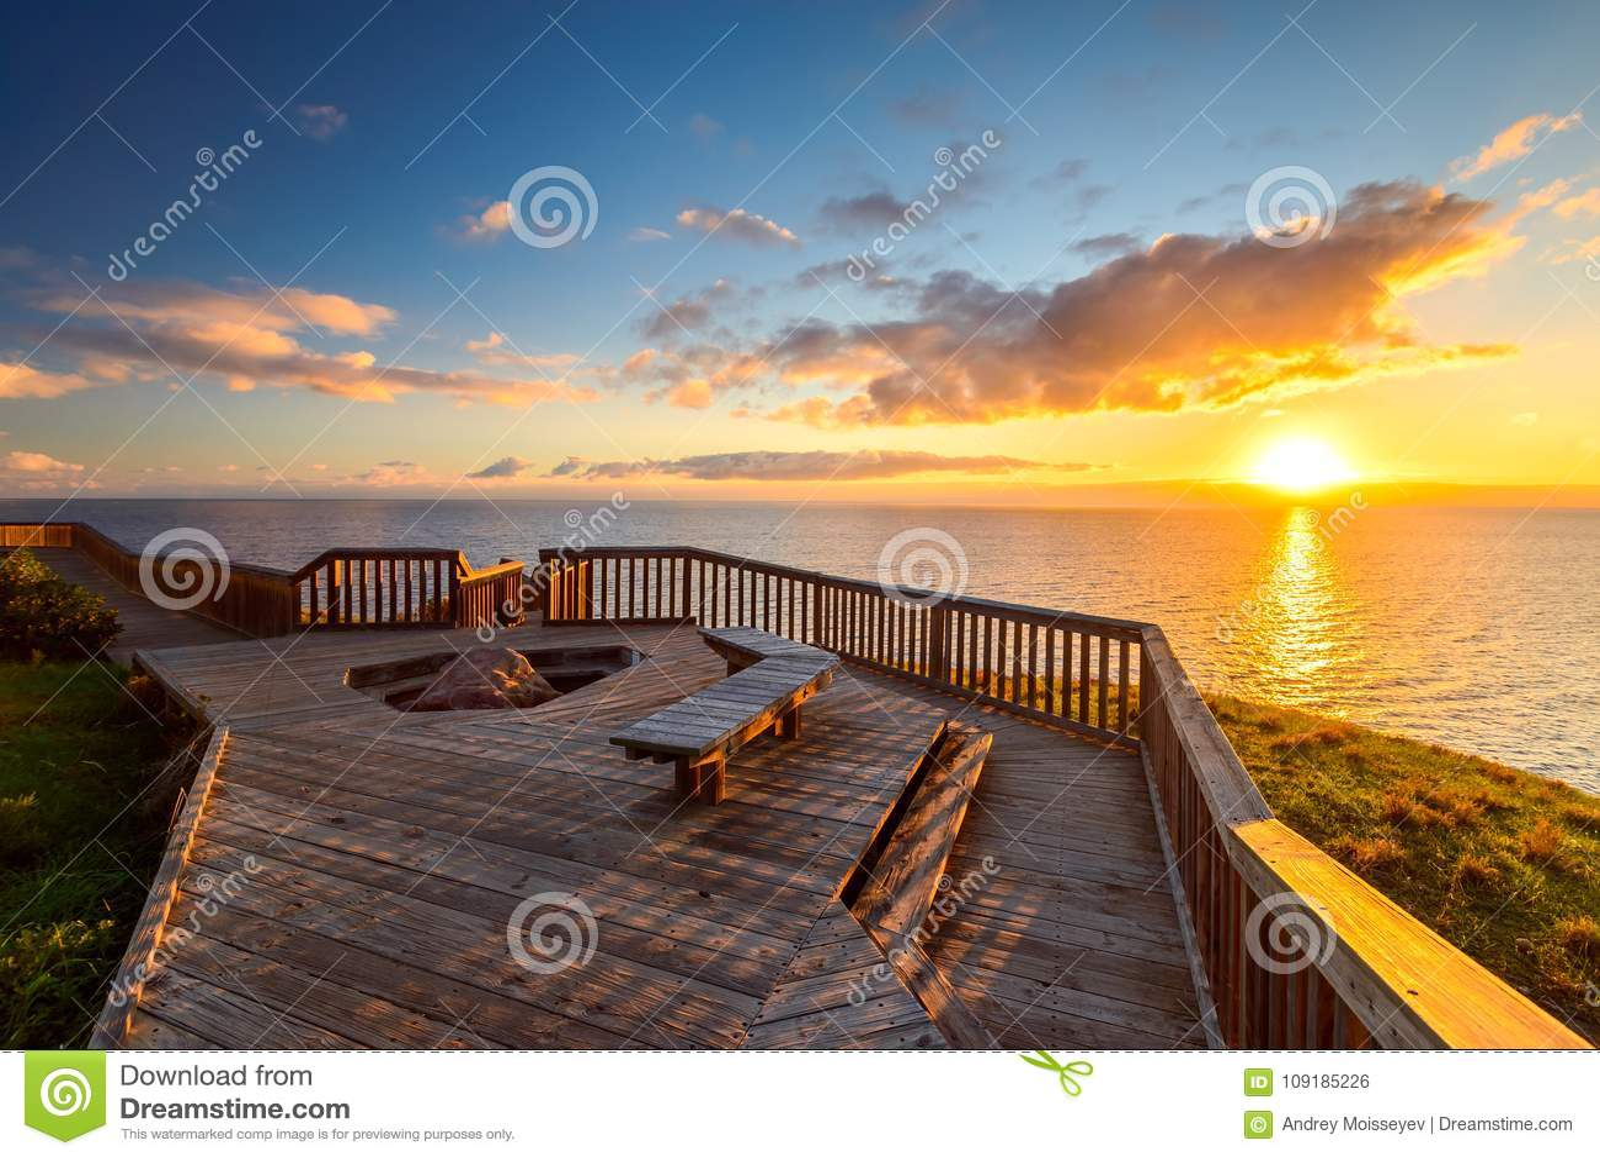 hallett cove boardwalk at sunset stock photo image of. Black Bedroom Furniture Sets. Home Design Ideas